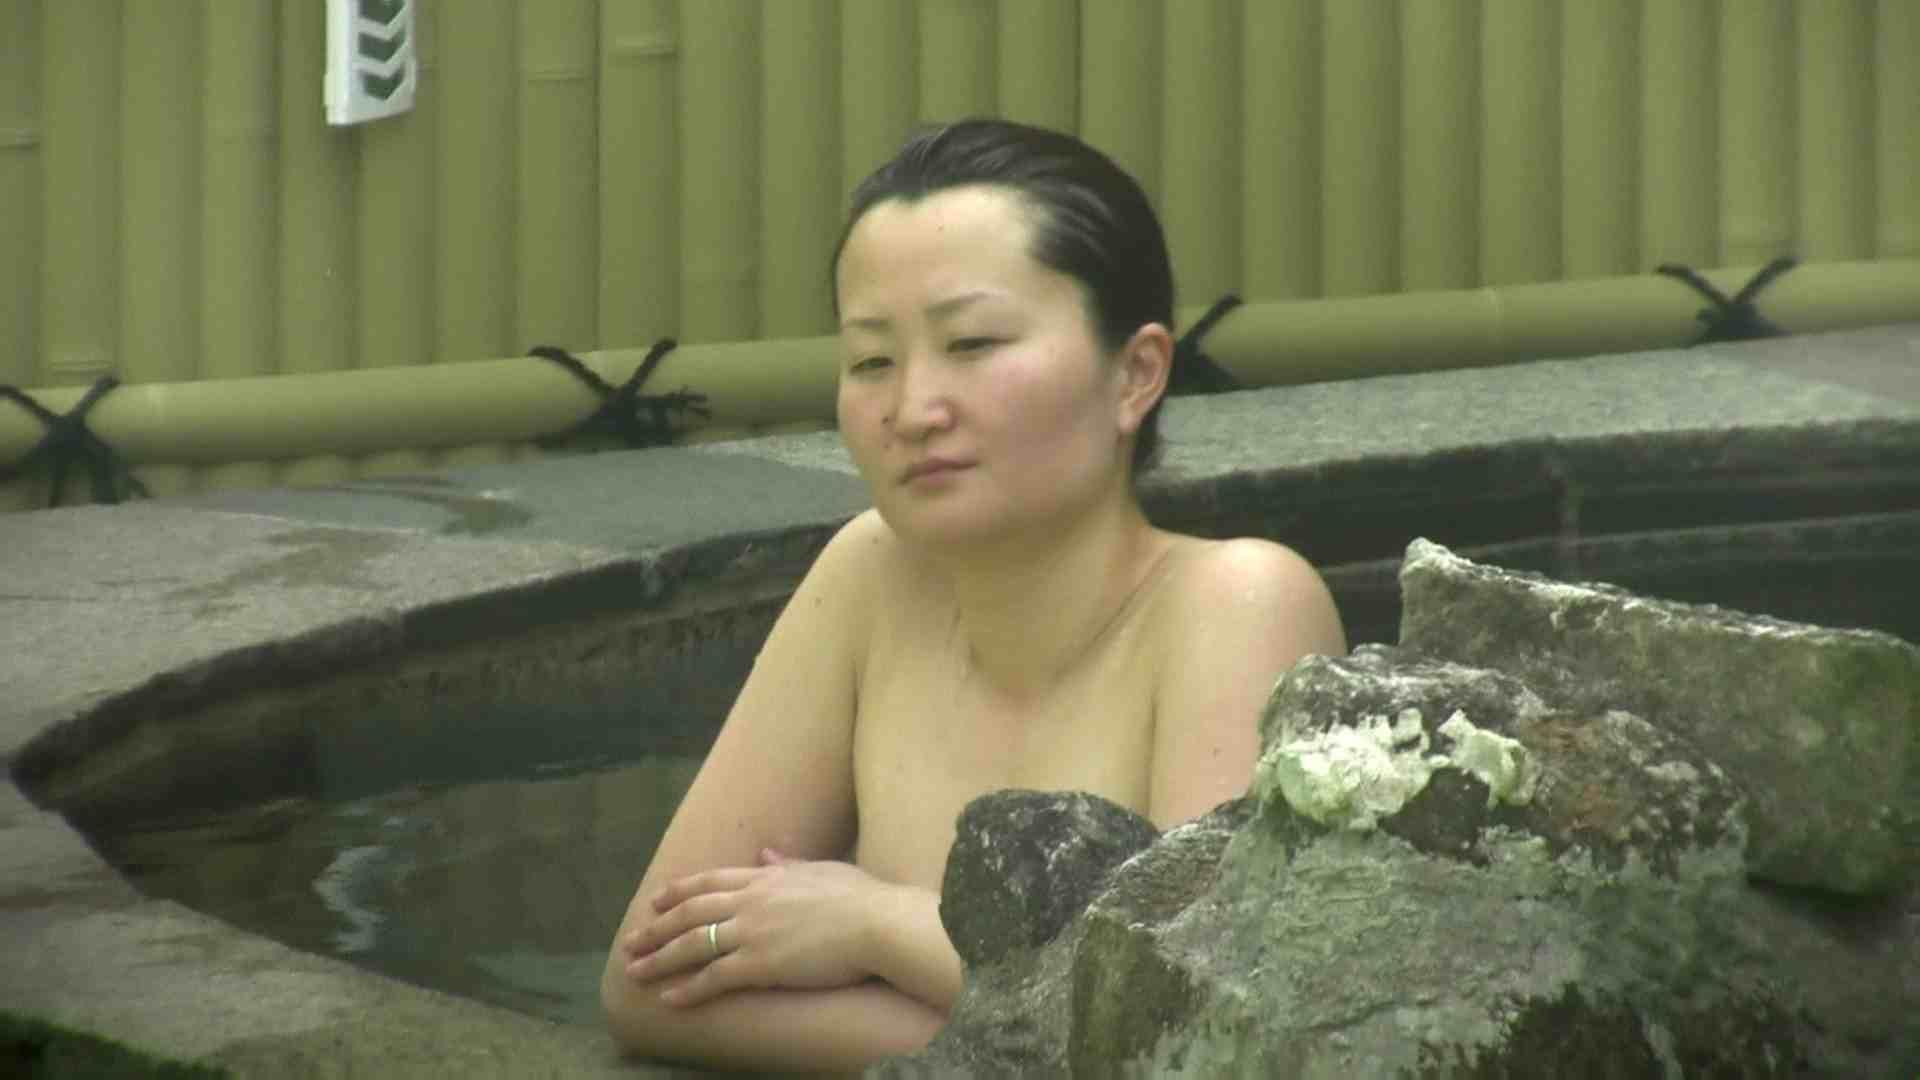 Aquaな露天風呂Vol.632 盗撮 | OLエロ画像  41PICs 10